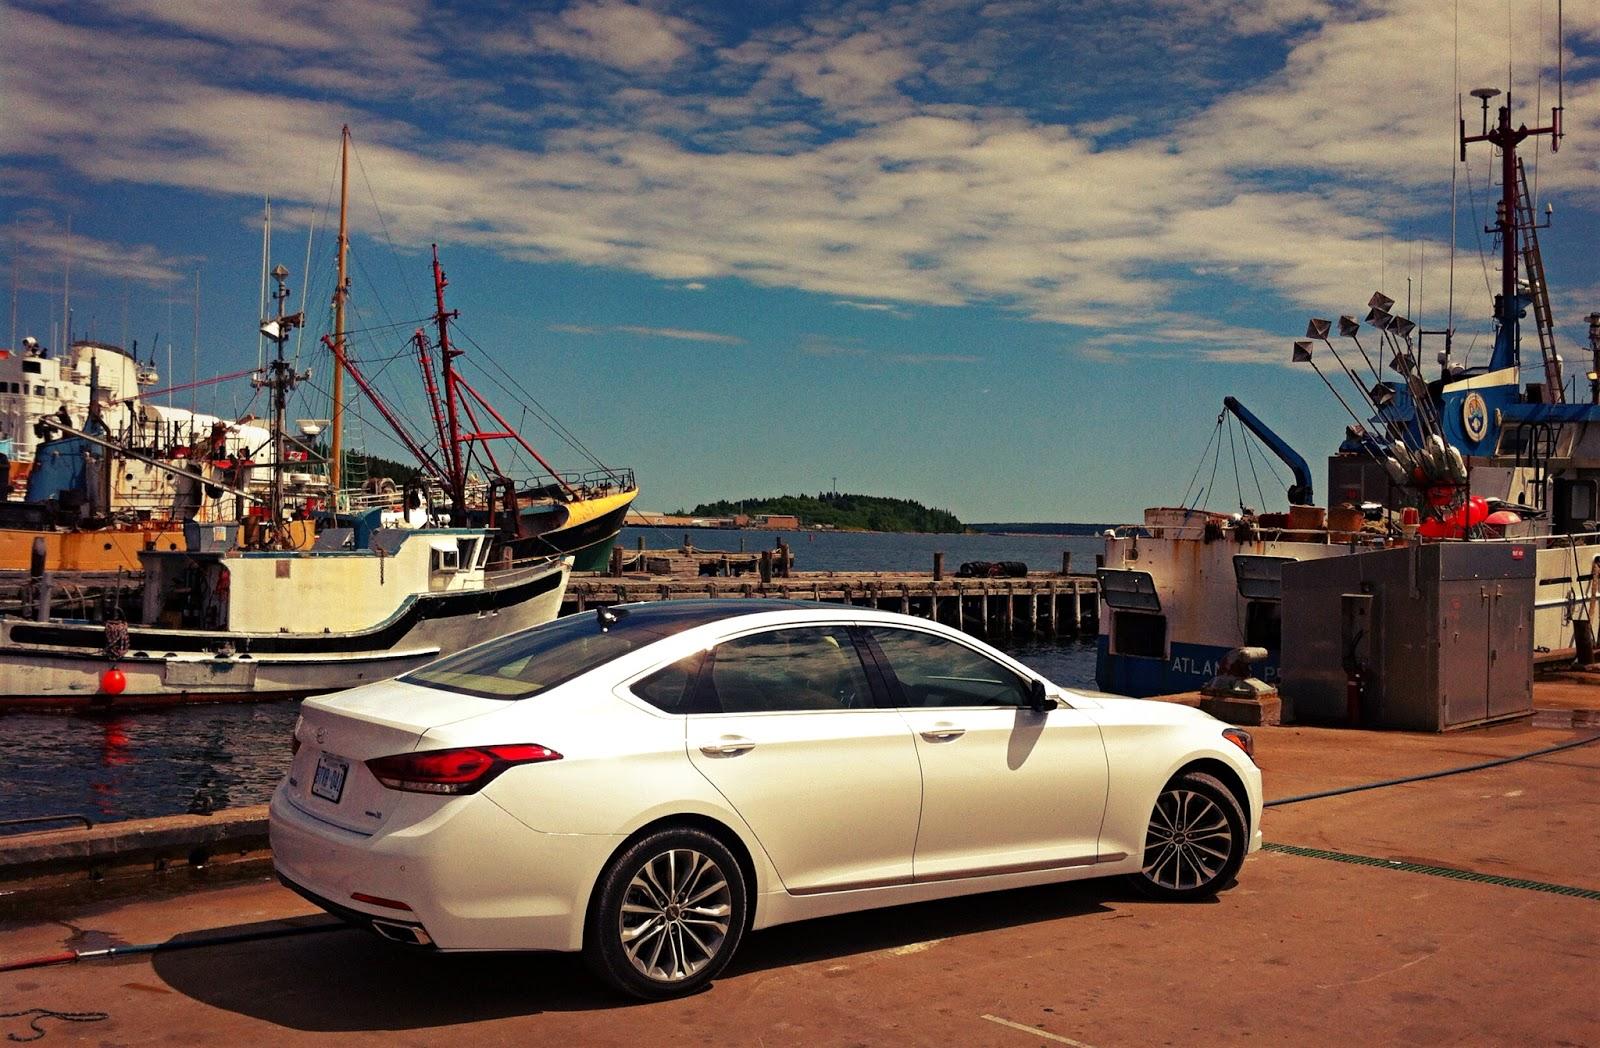 2015 Hyundai Genesis Lunenburg wharf